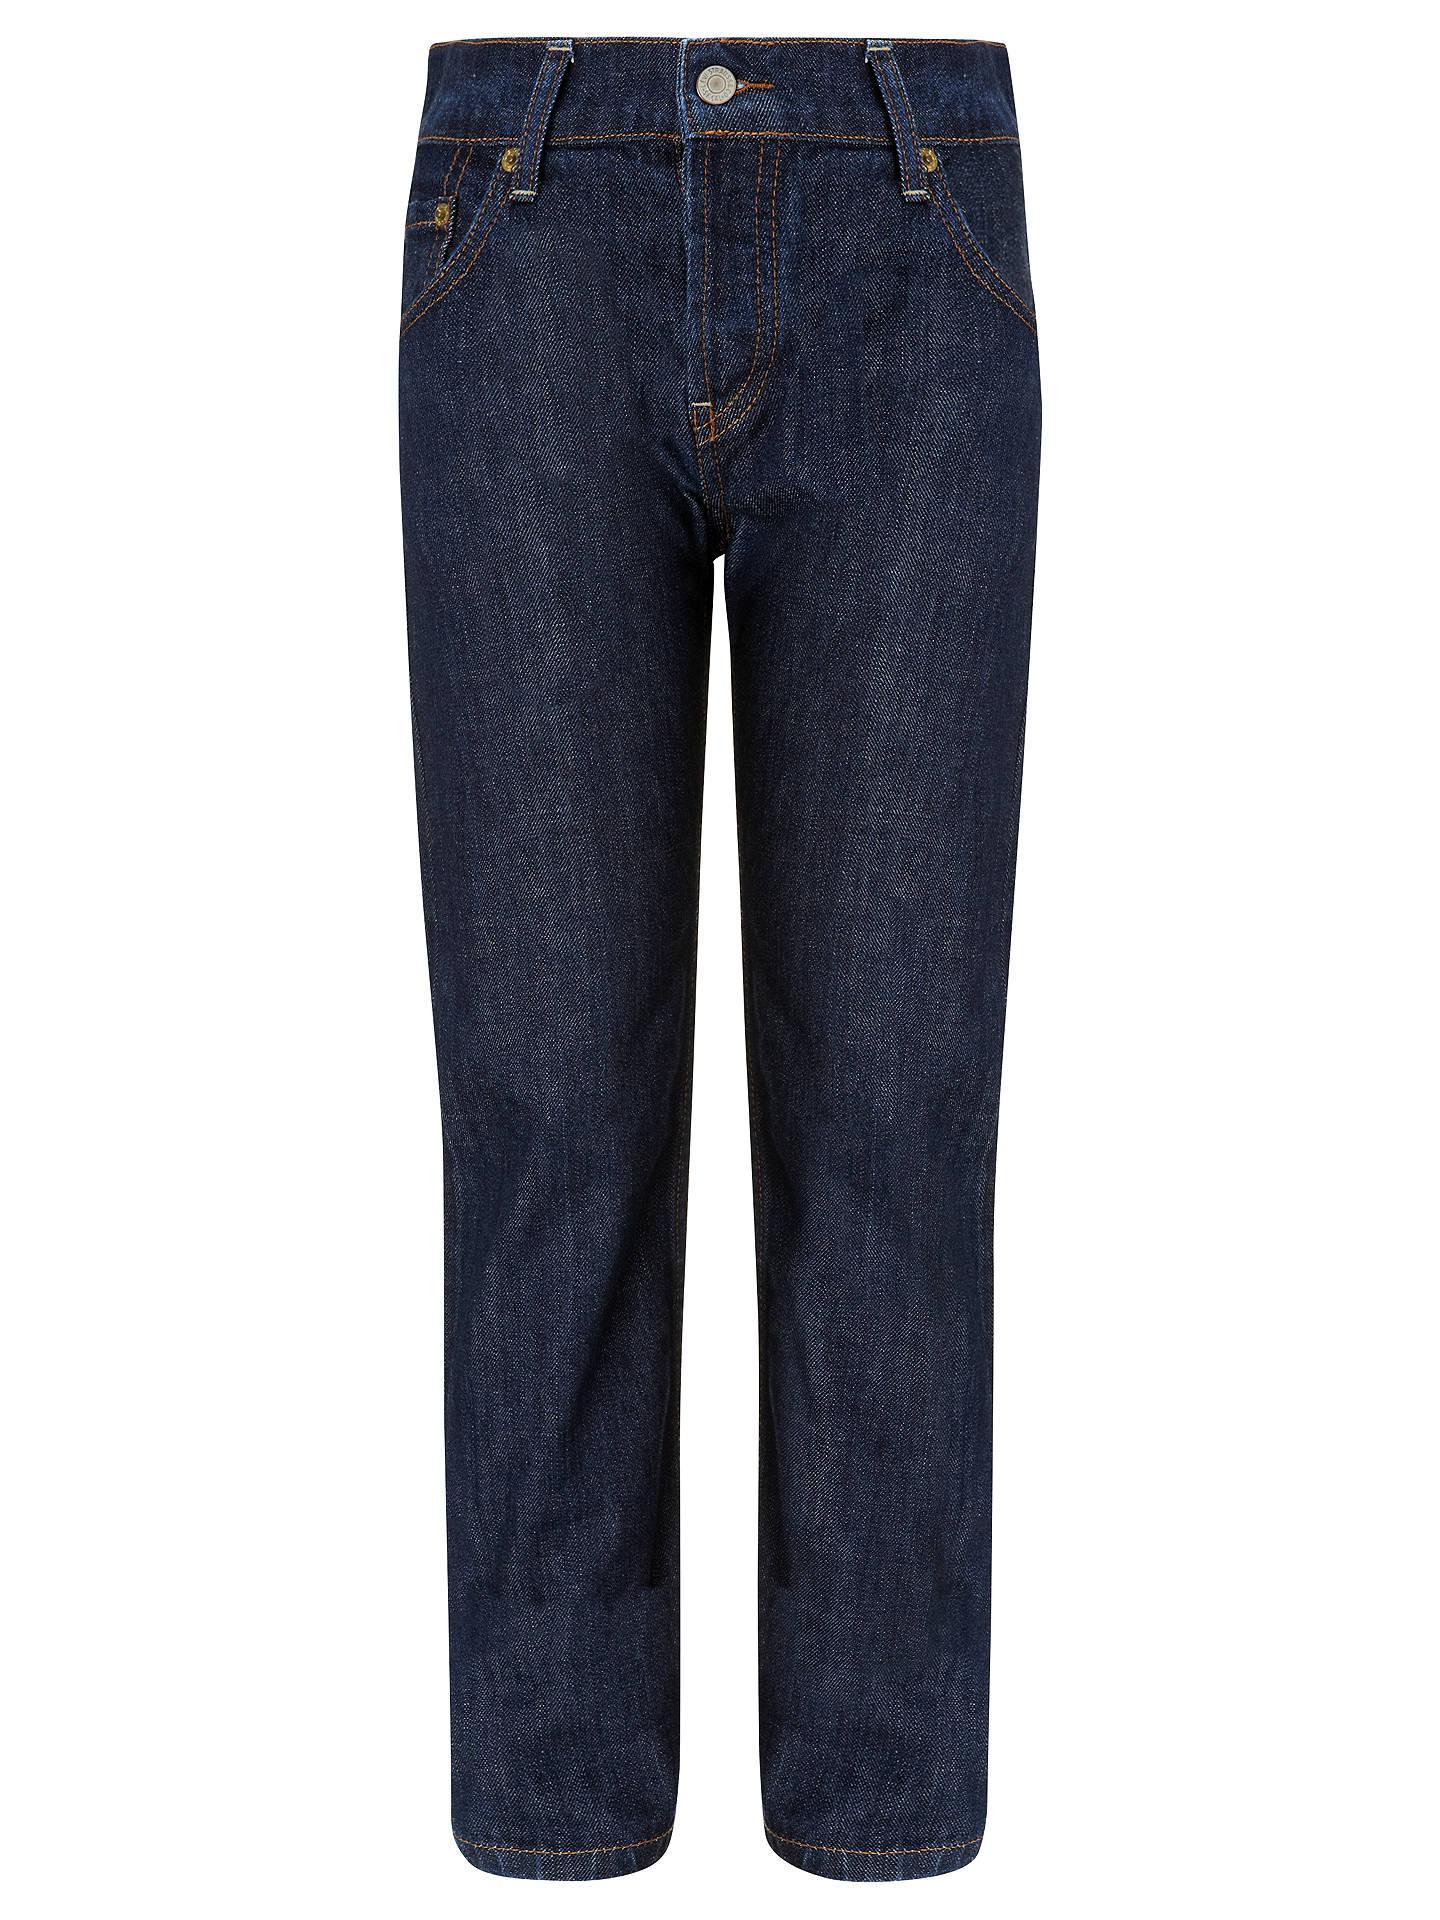 c9fbcd58d310a4 Buy Levi's 501 Boys' Straight Danny Dark Denim Jeans , Blue, 14 years  Online ...